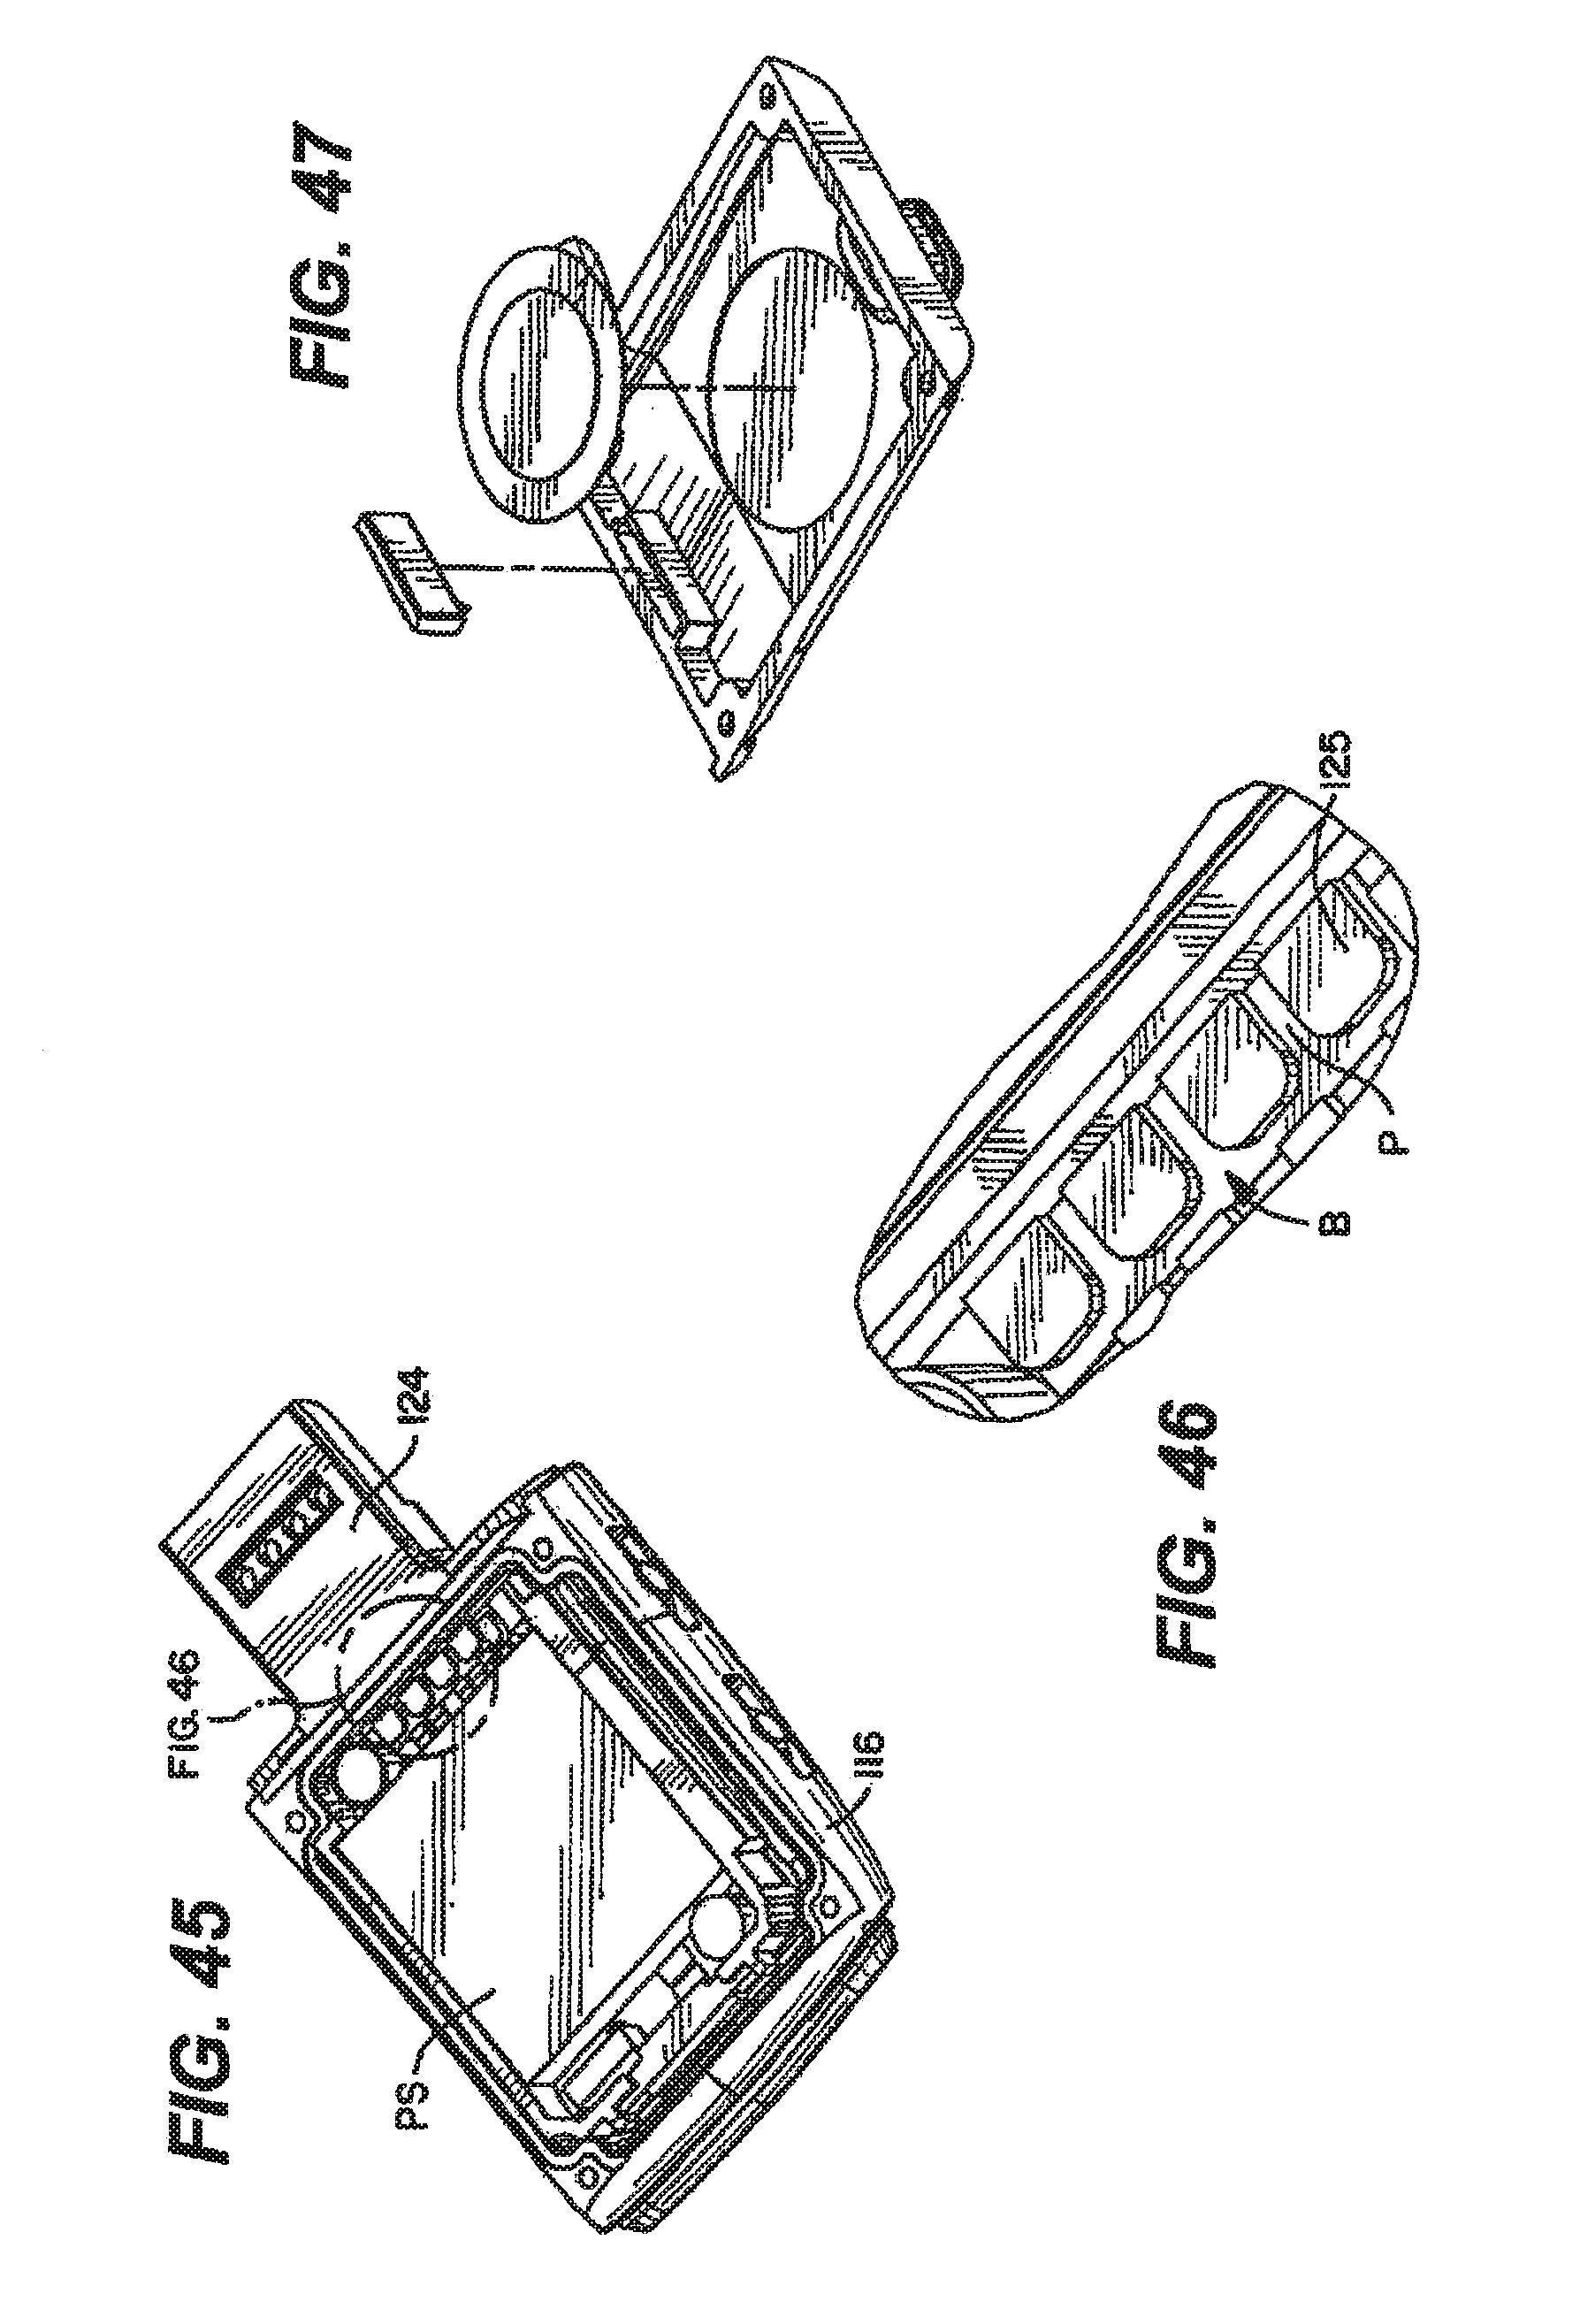 Patent Us 9891596 B2 1989 In Car Wiring Schematics Third Generation Fbody Message Images